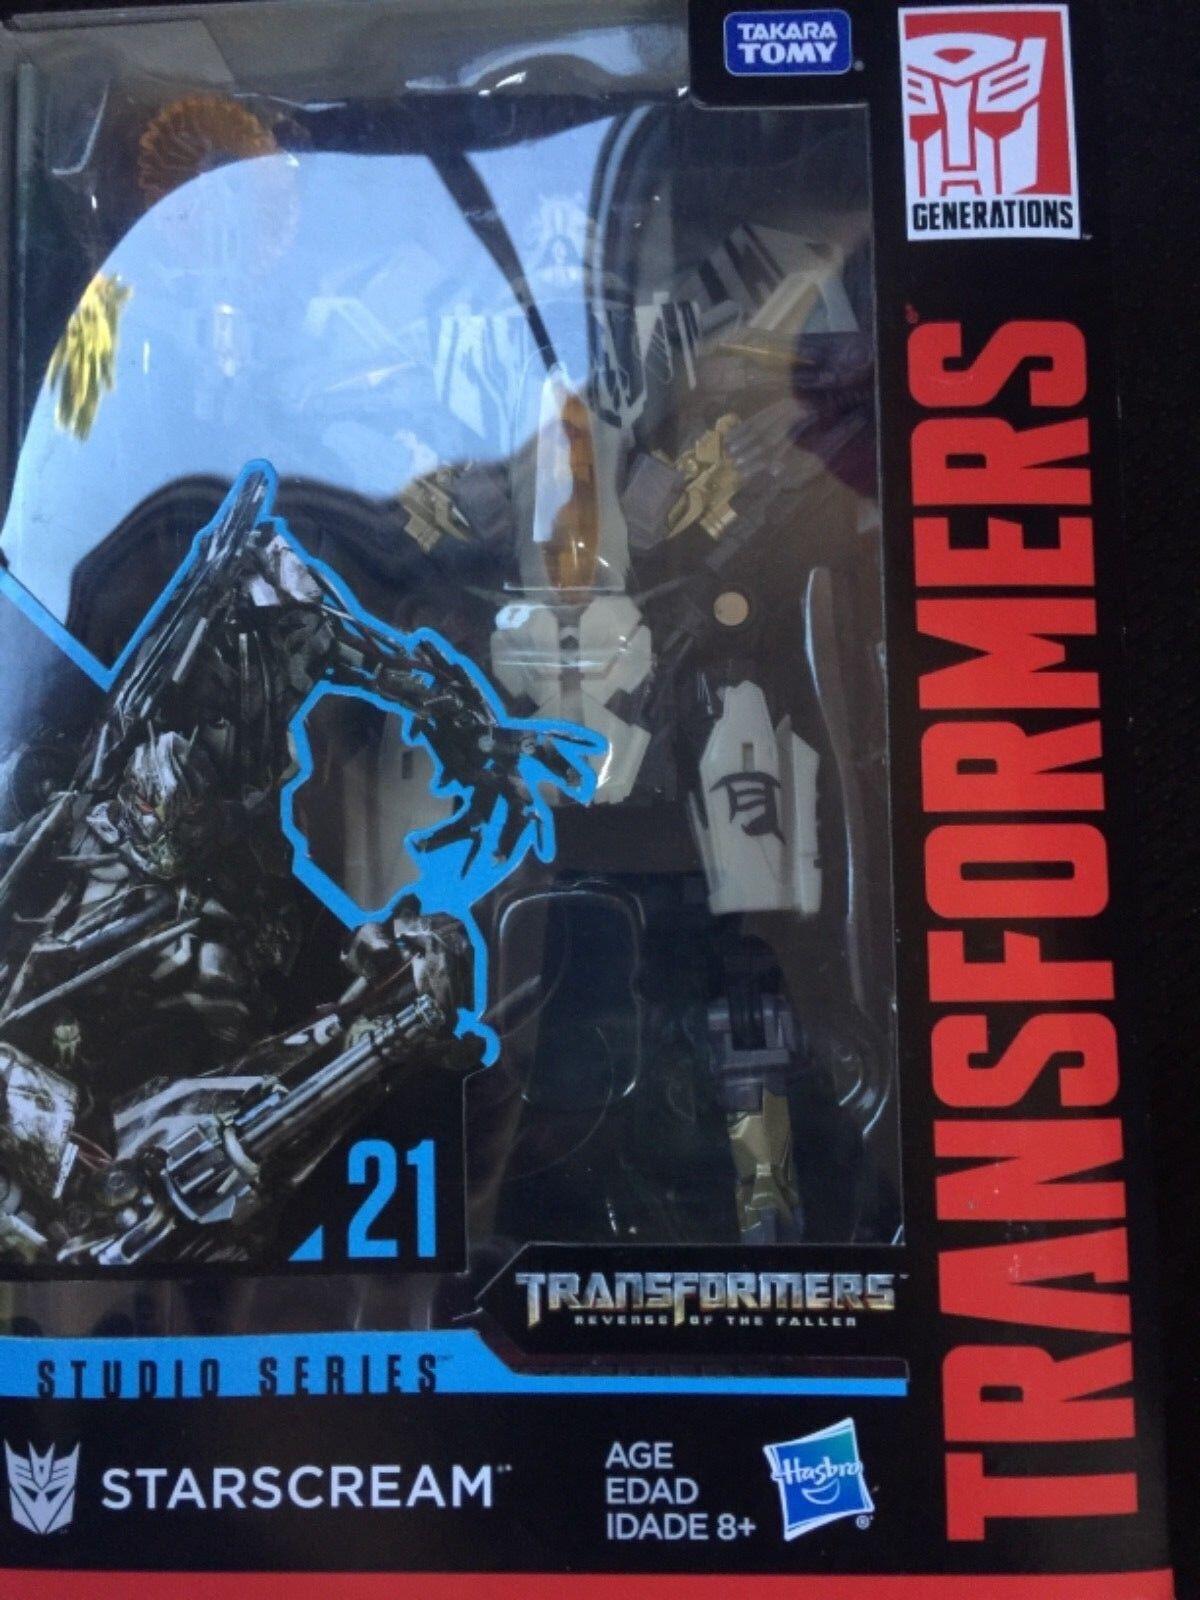 Transformers Generations Studio Series 21 Voyager Class Movie 2 Starscream